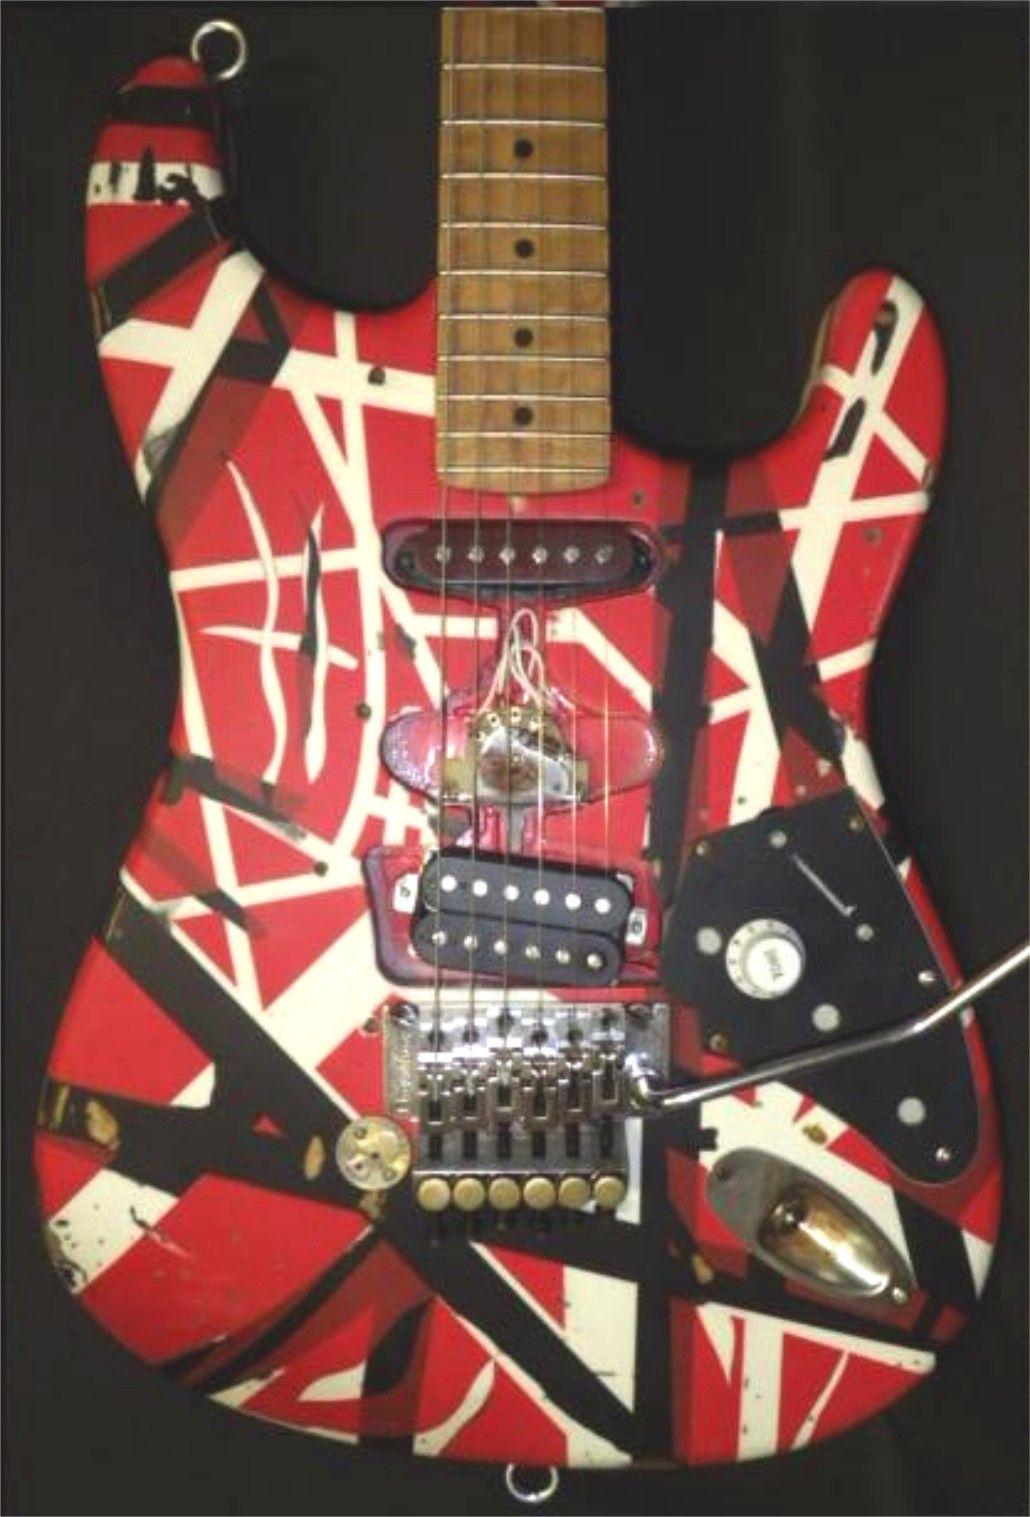 My New Meanstreet Evh Frankenstein Guitar Another Masterpiece By Mitchel Floyd Awesome Guitar Eddie Van Halen Classic Guitar